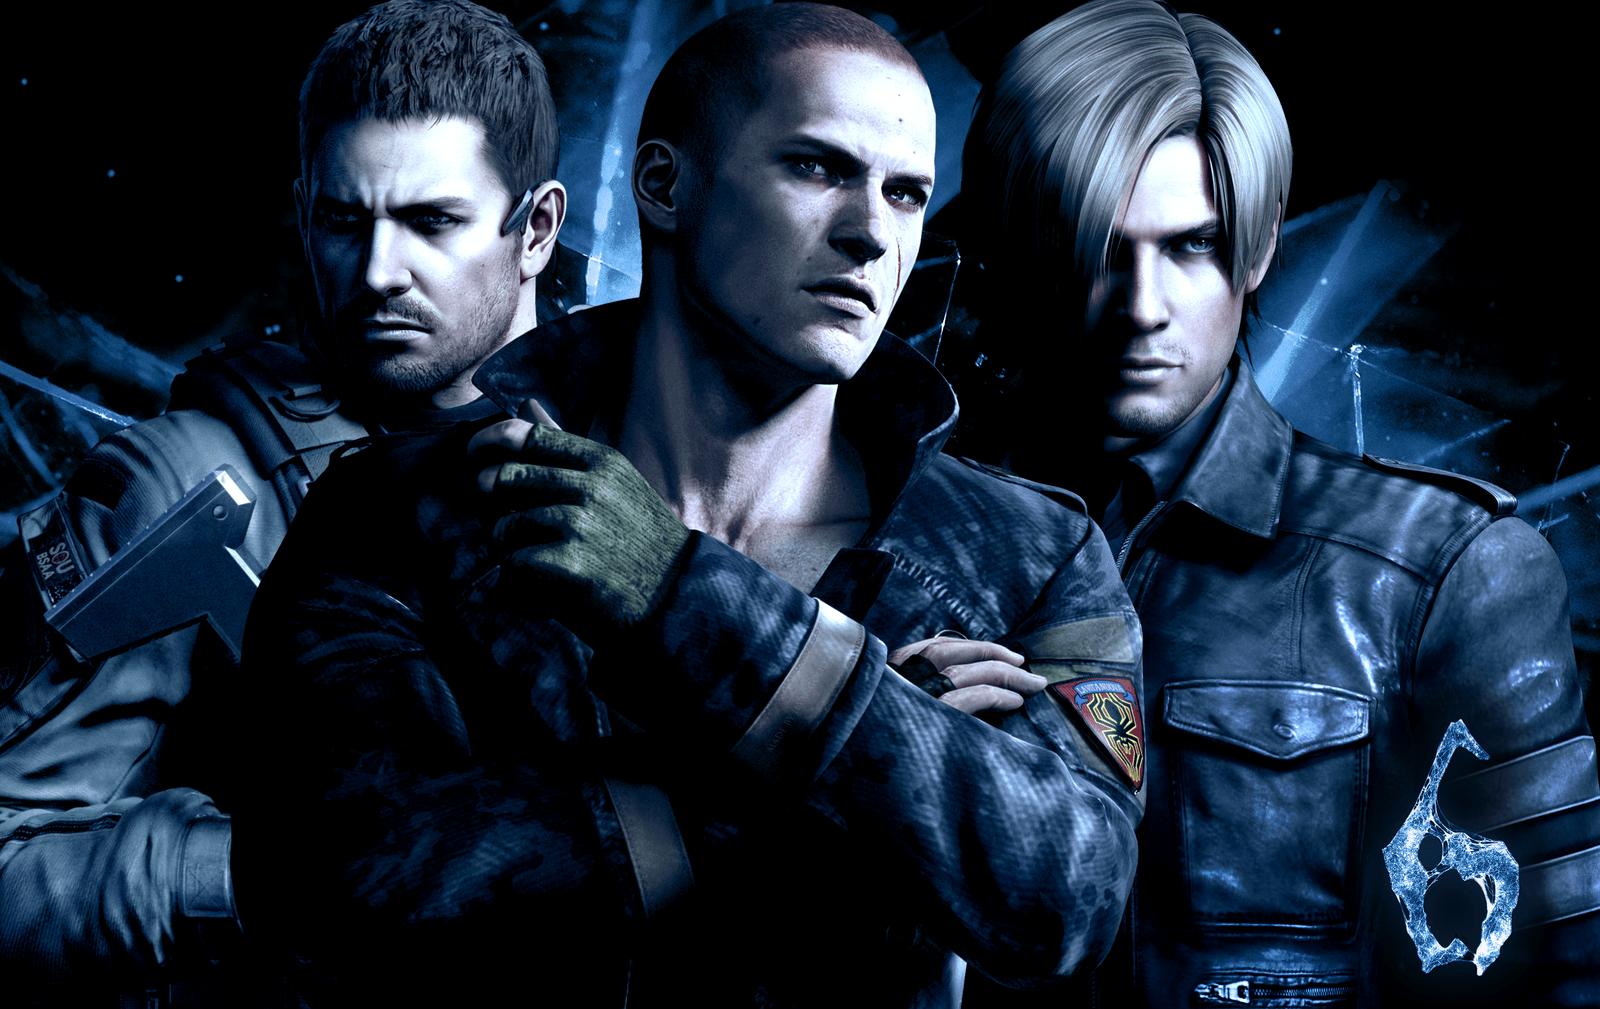 Resident Evil 6 Wallpapers - Wallpaper Cave